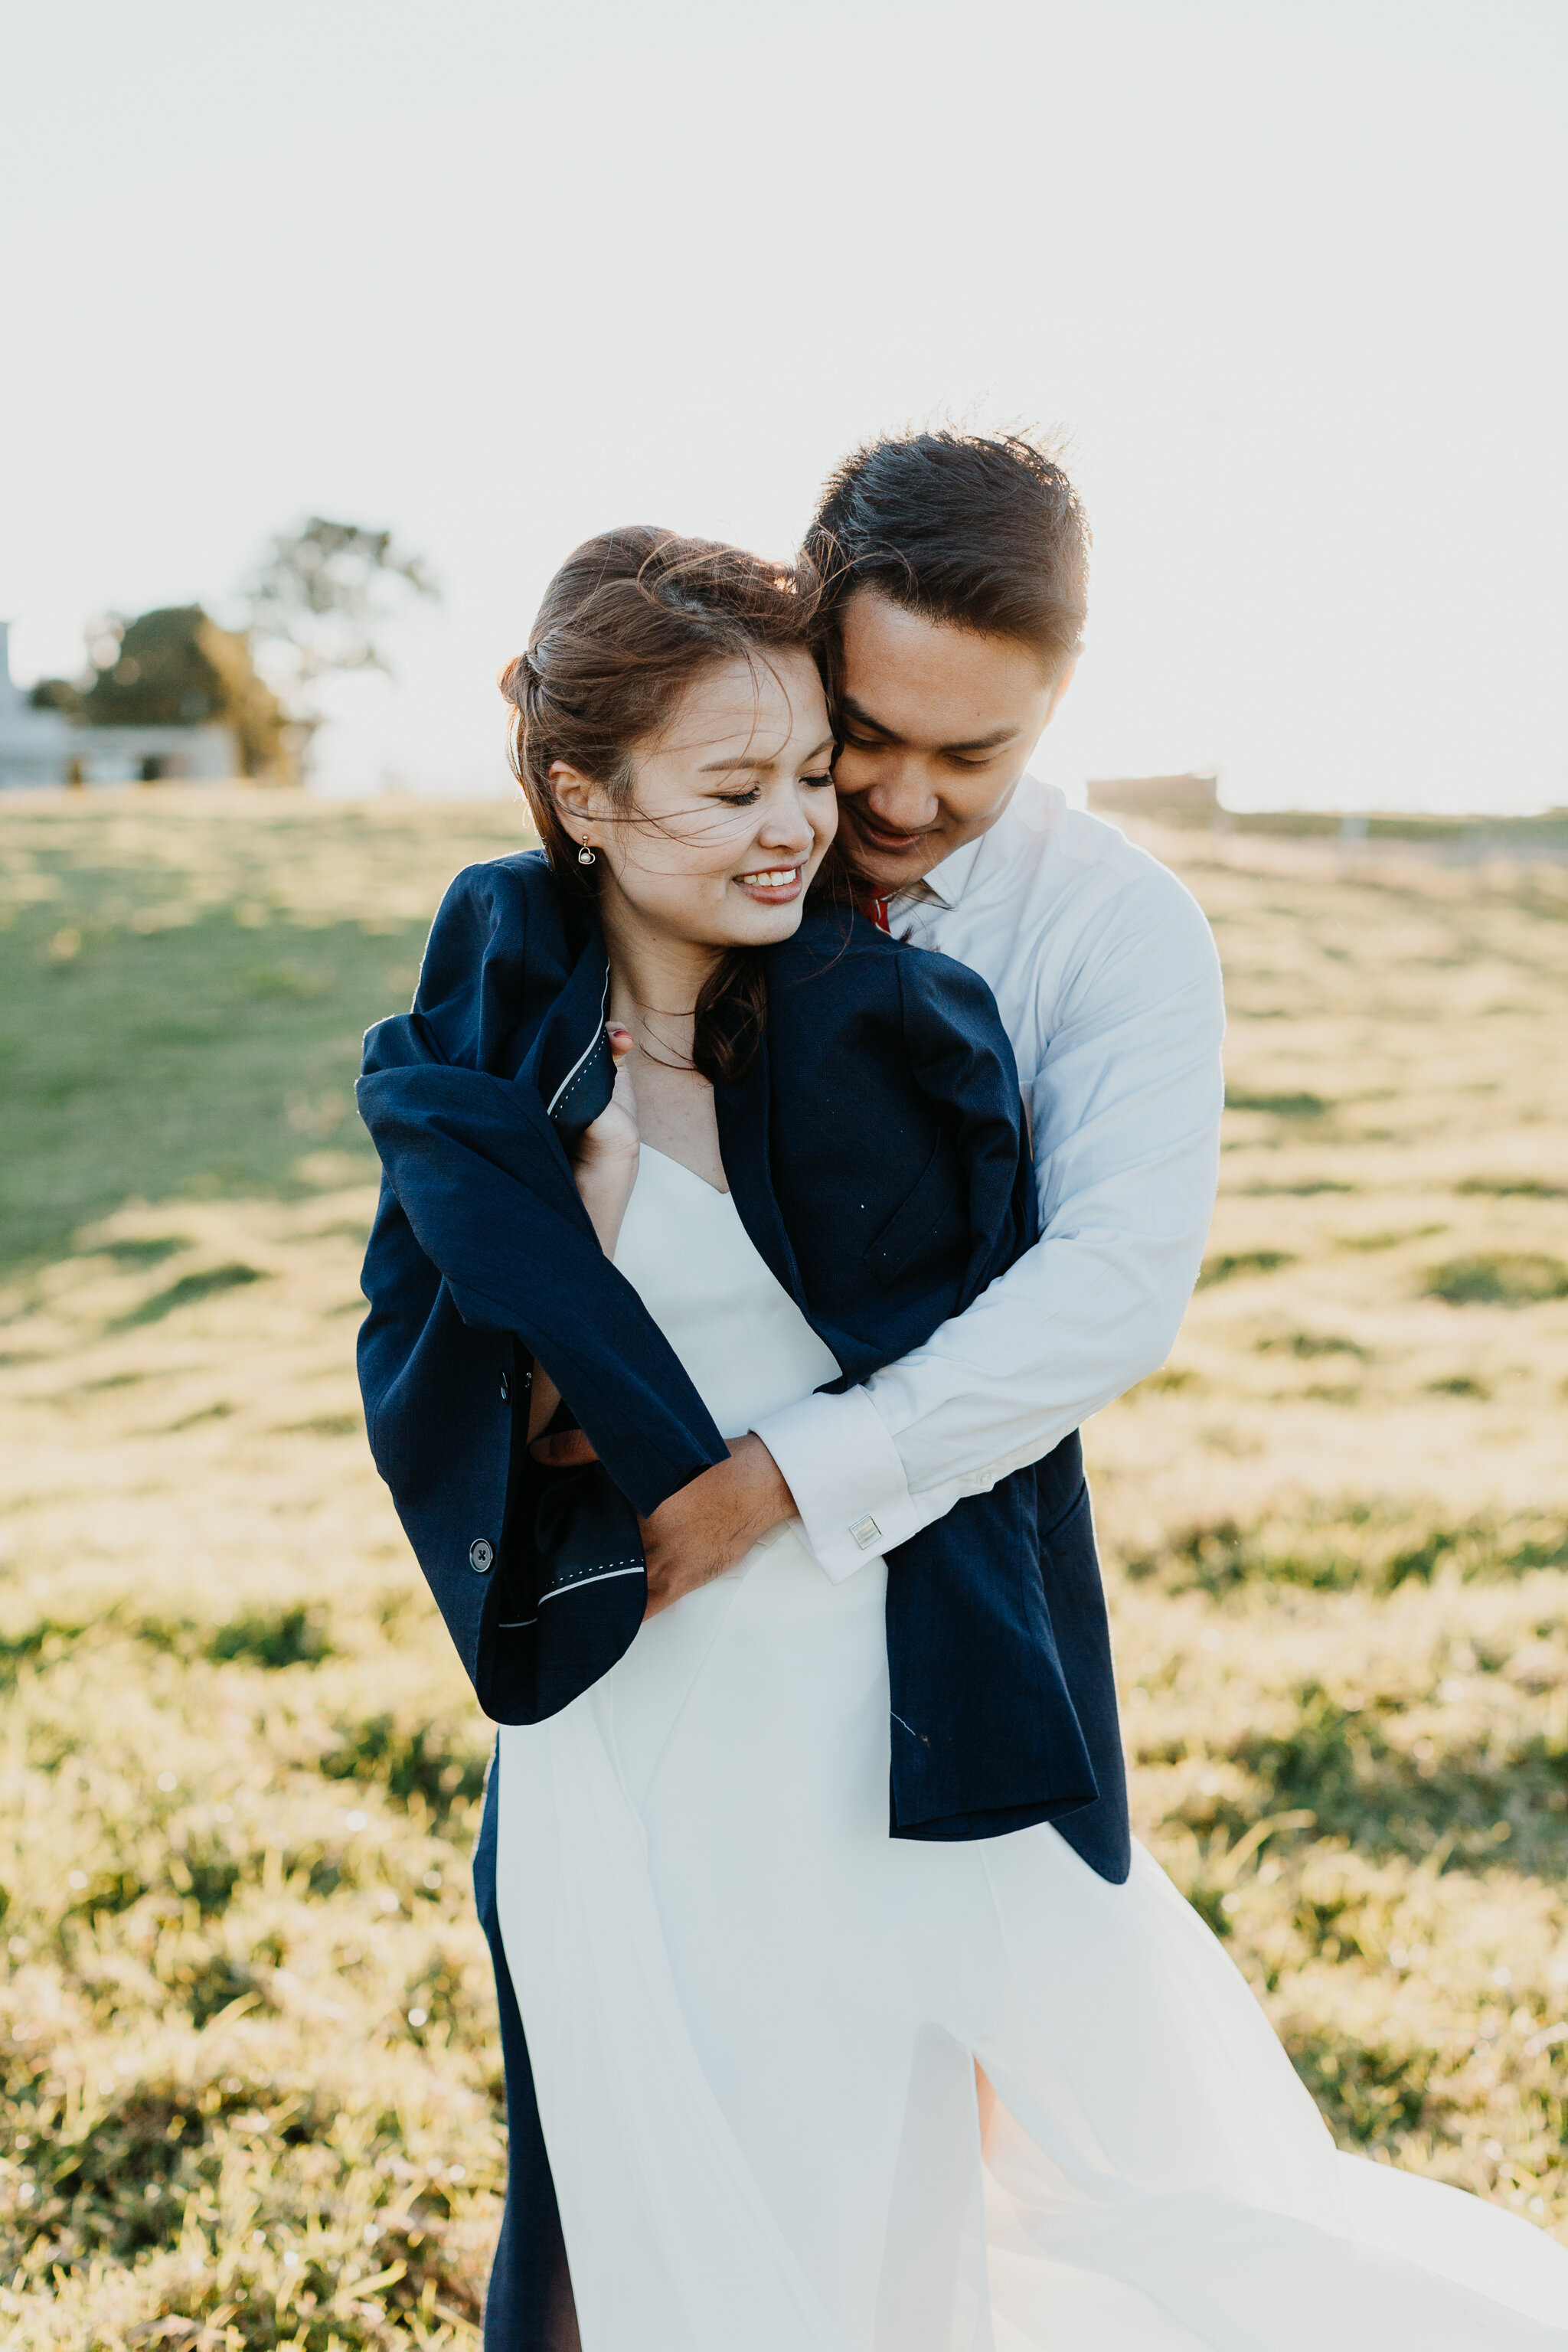 Maleny One Tree Hill Wedding - Maleny Wedding Photographer-8.jpg